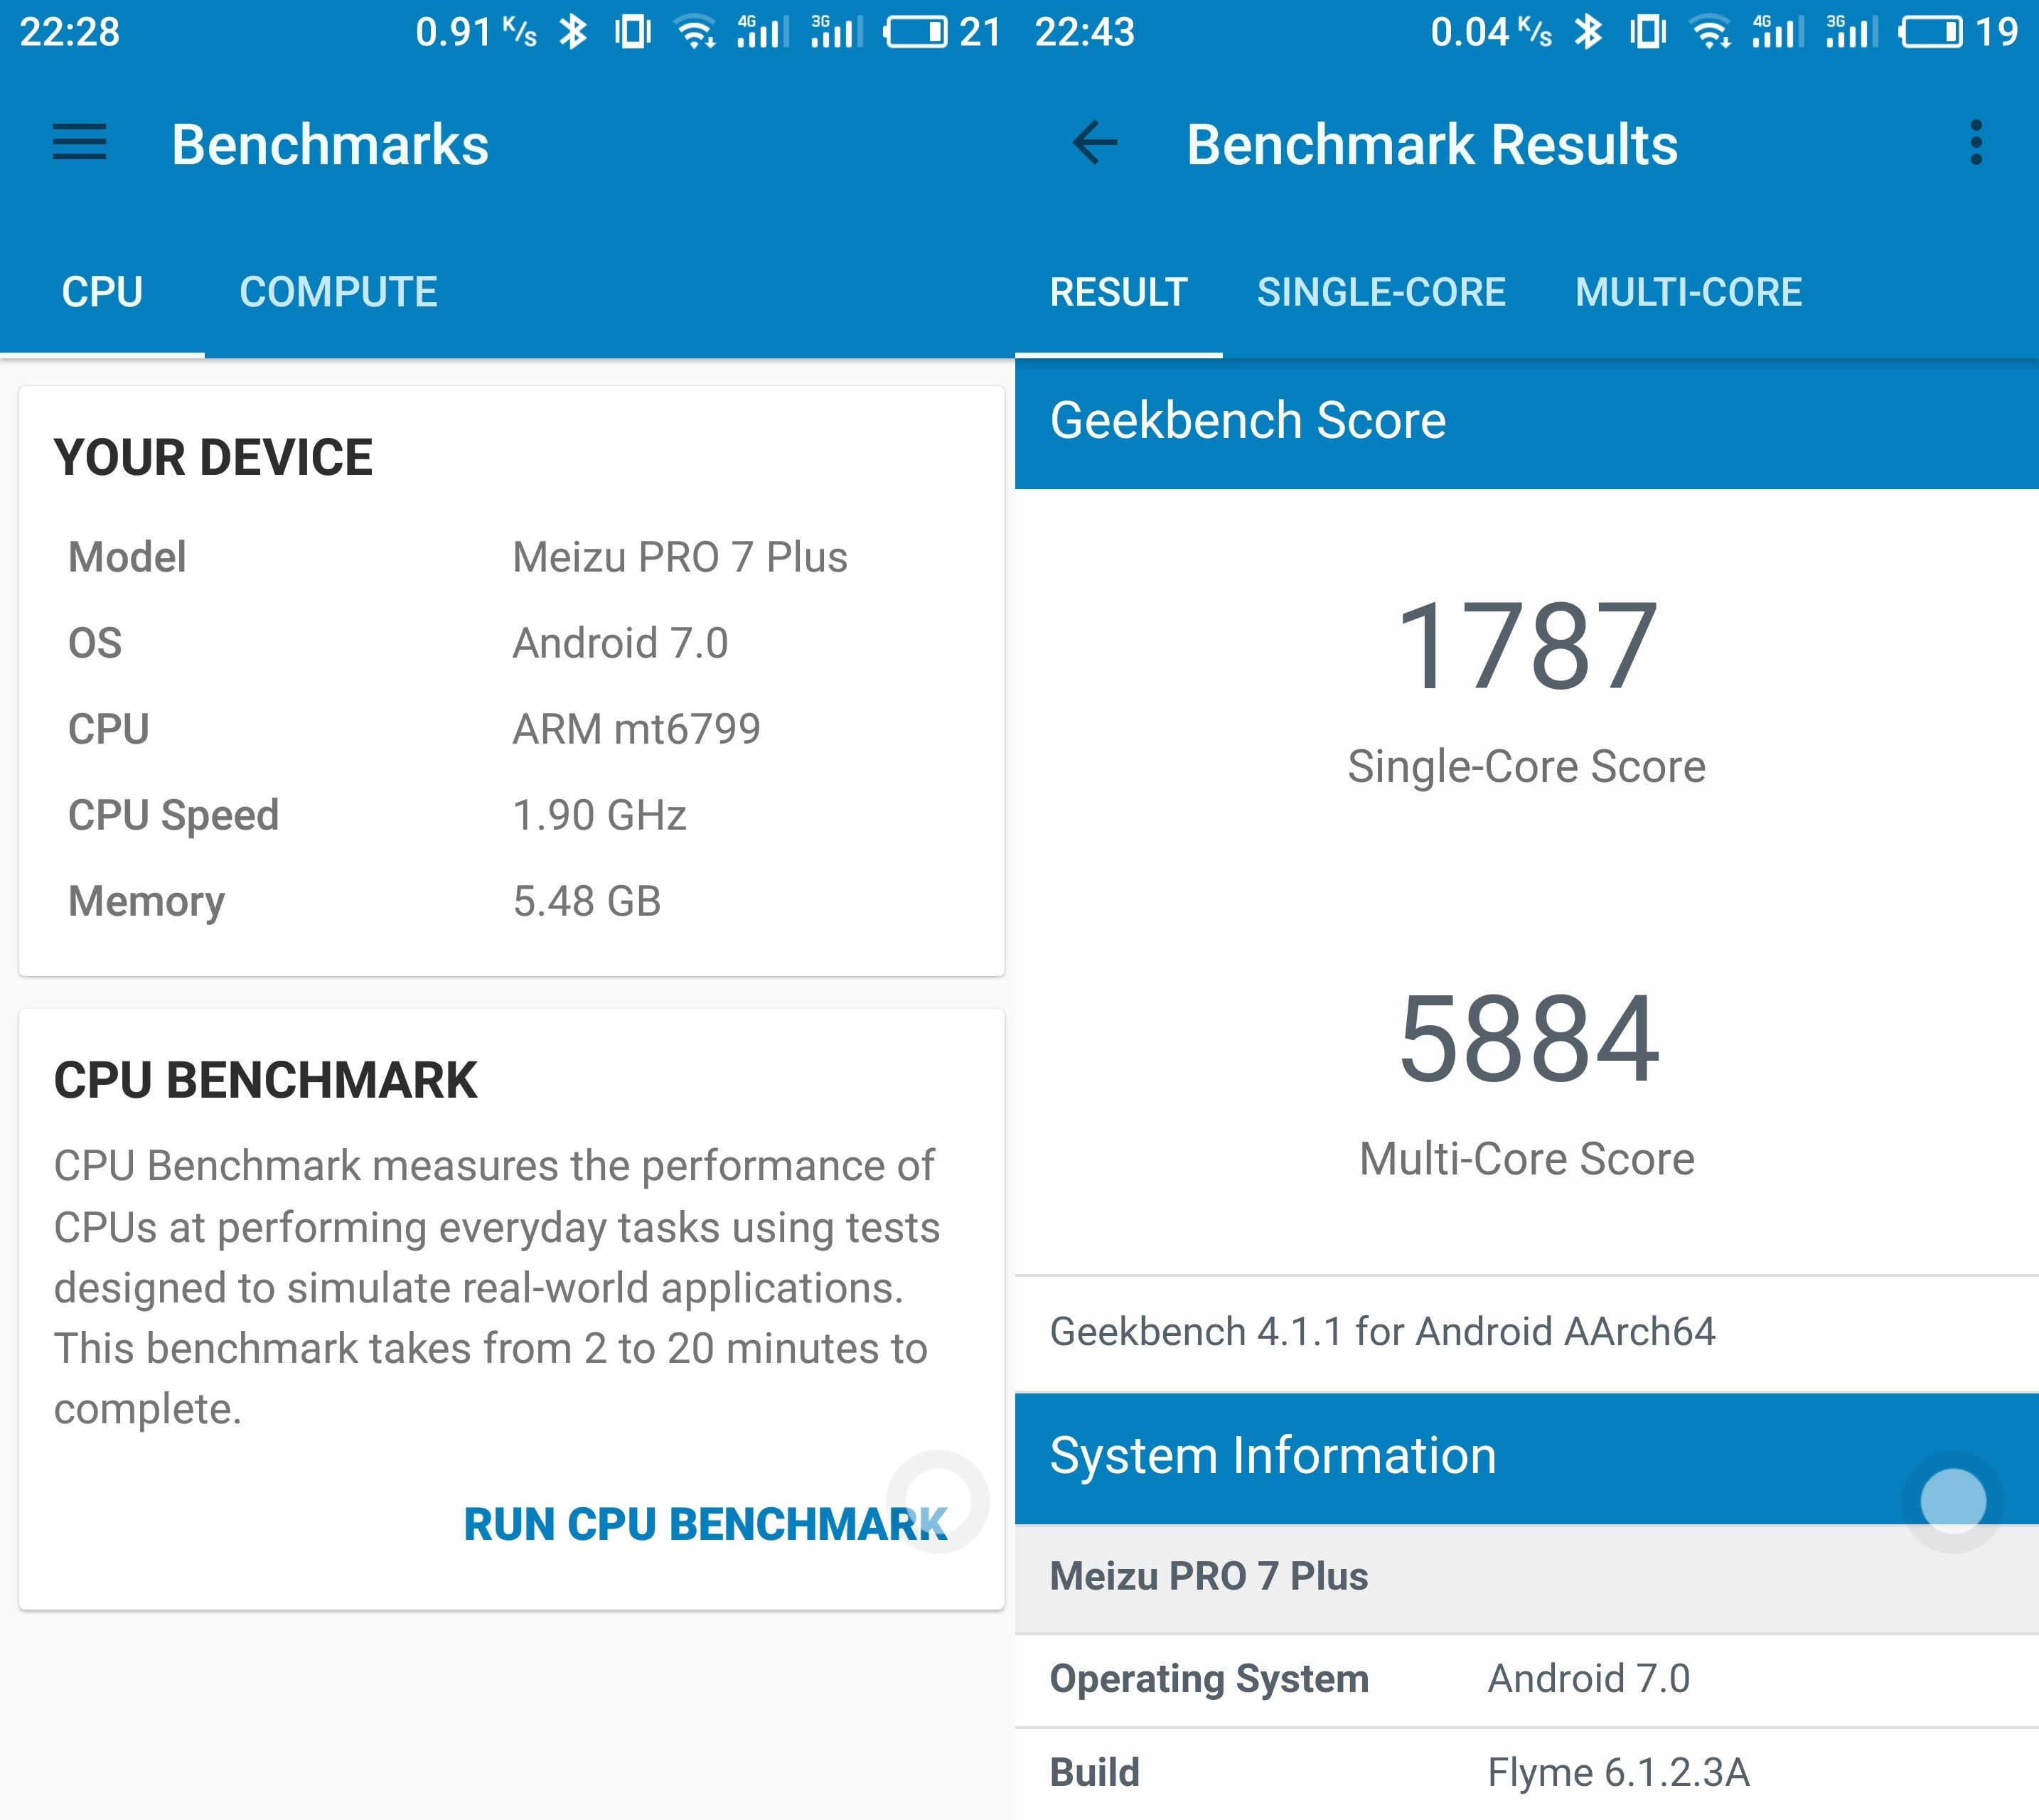 Meizu PRO 7-H(Helio X30)、Meizu PRO 7 PlusがGeekbench 4での計測が可能に